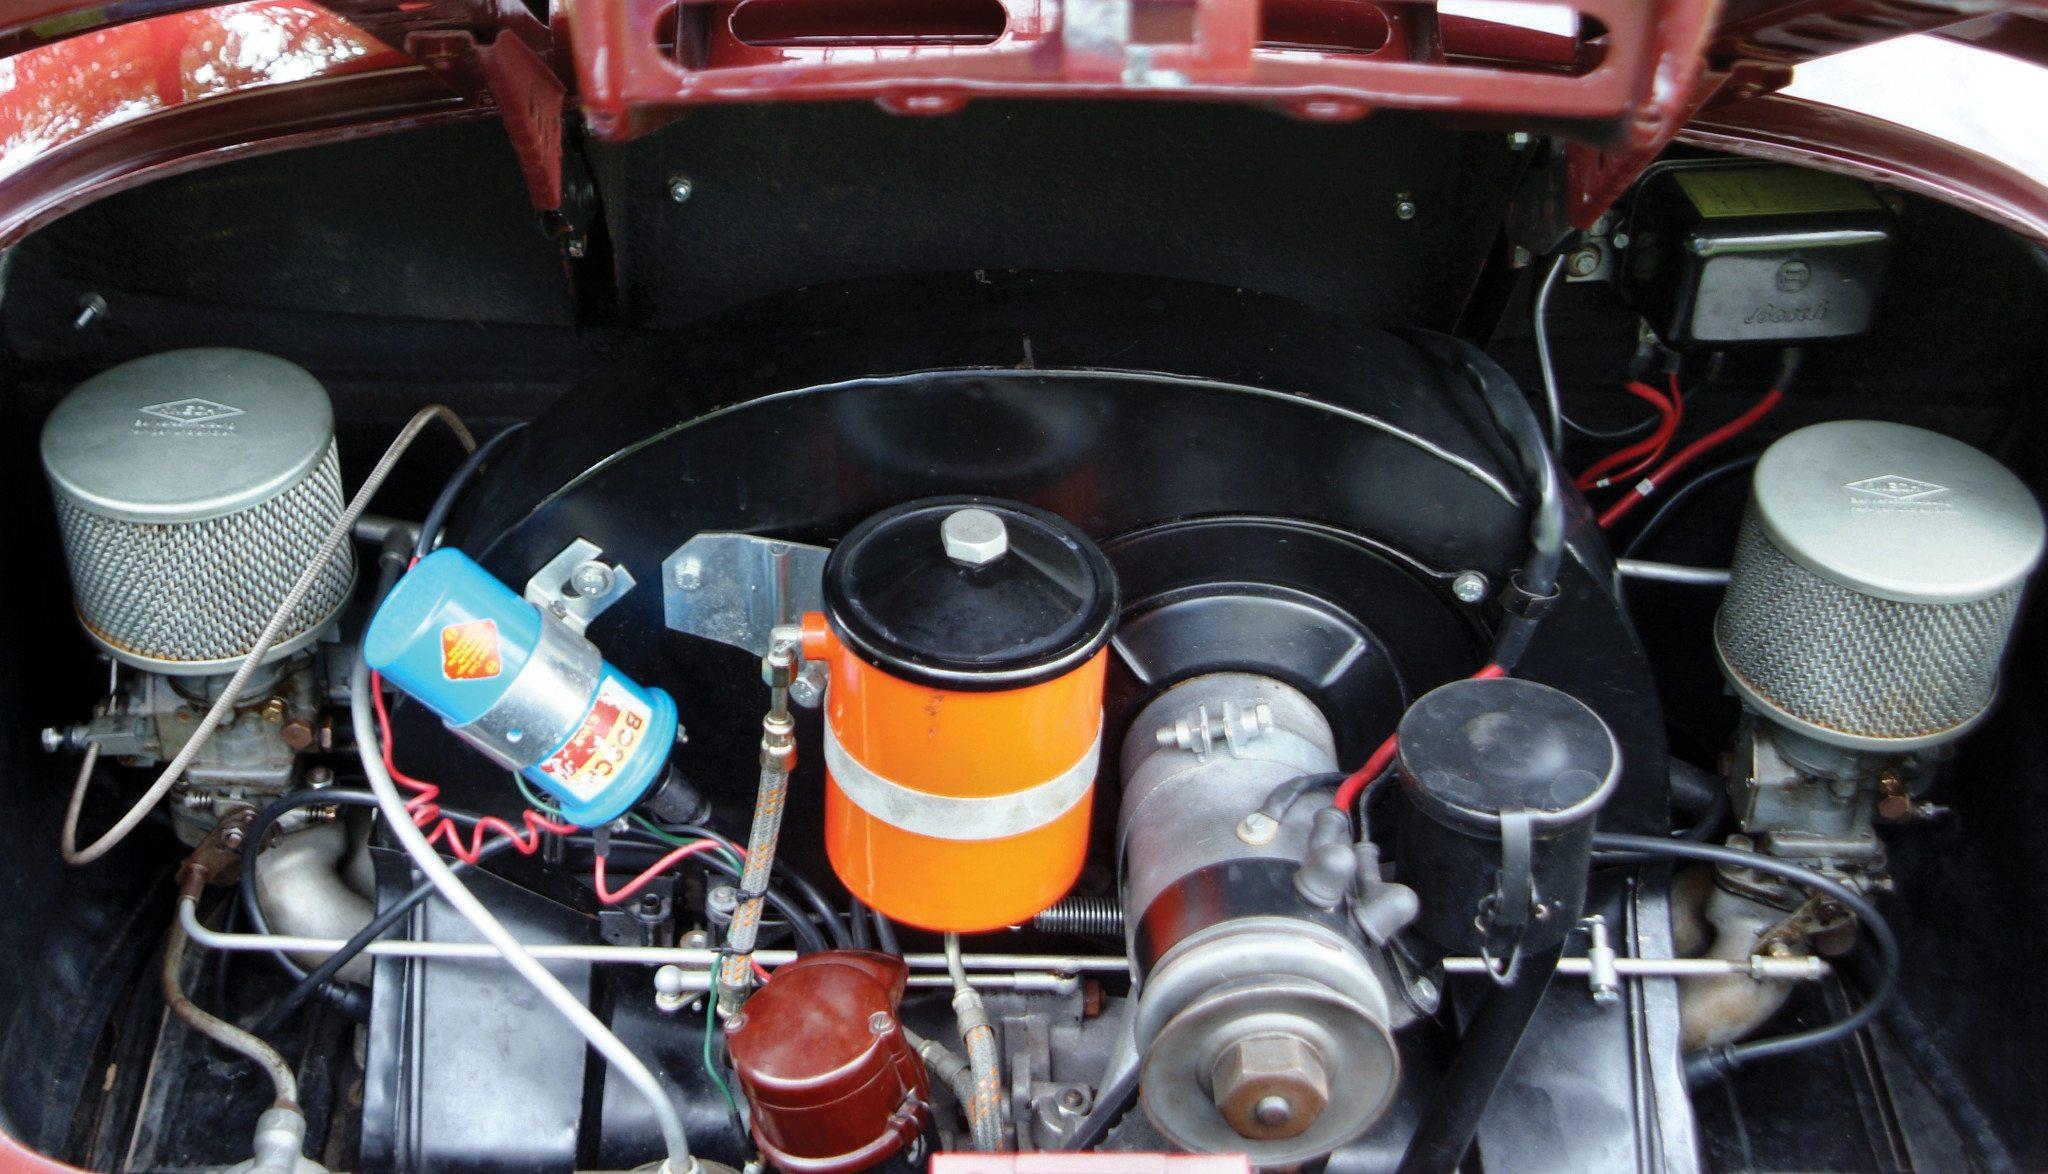 356 Continental 1.5l 1500cc flat four cylinder